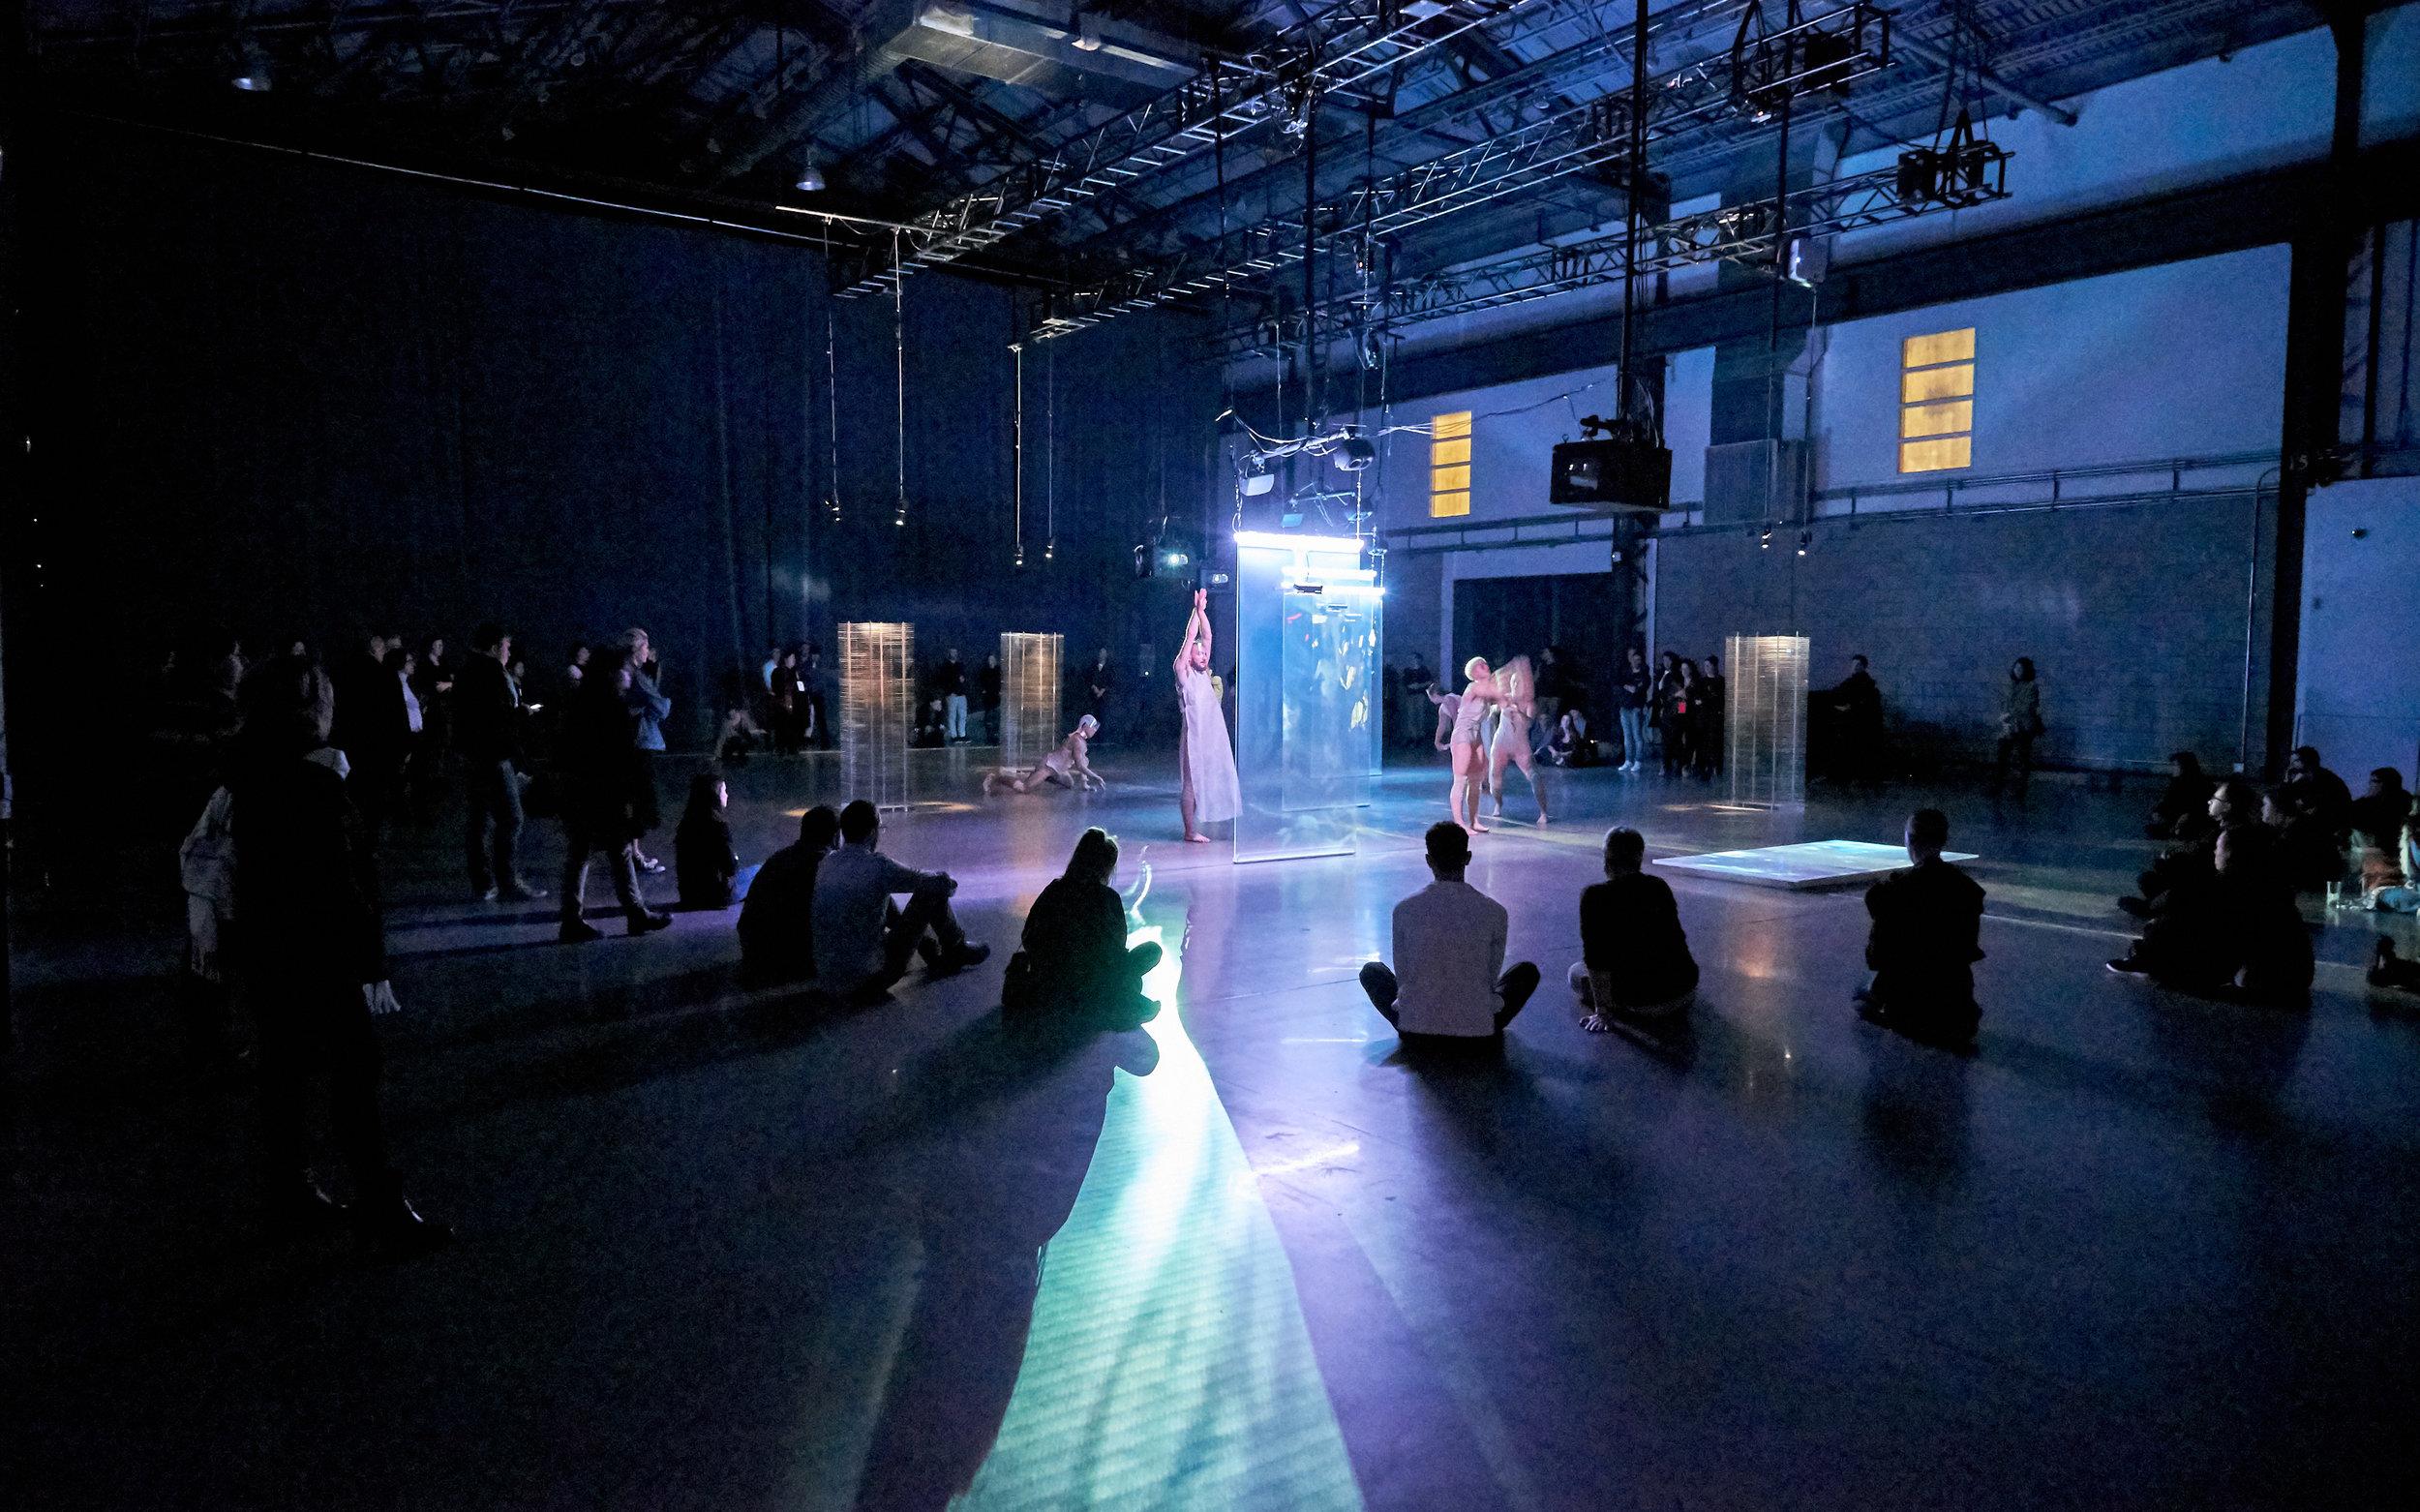 mardi-culturel-td-danse-danse-la-otra-orilla-van-grimde-corps-secrets-16.jpg